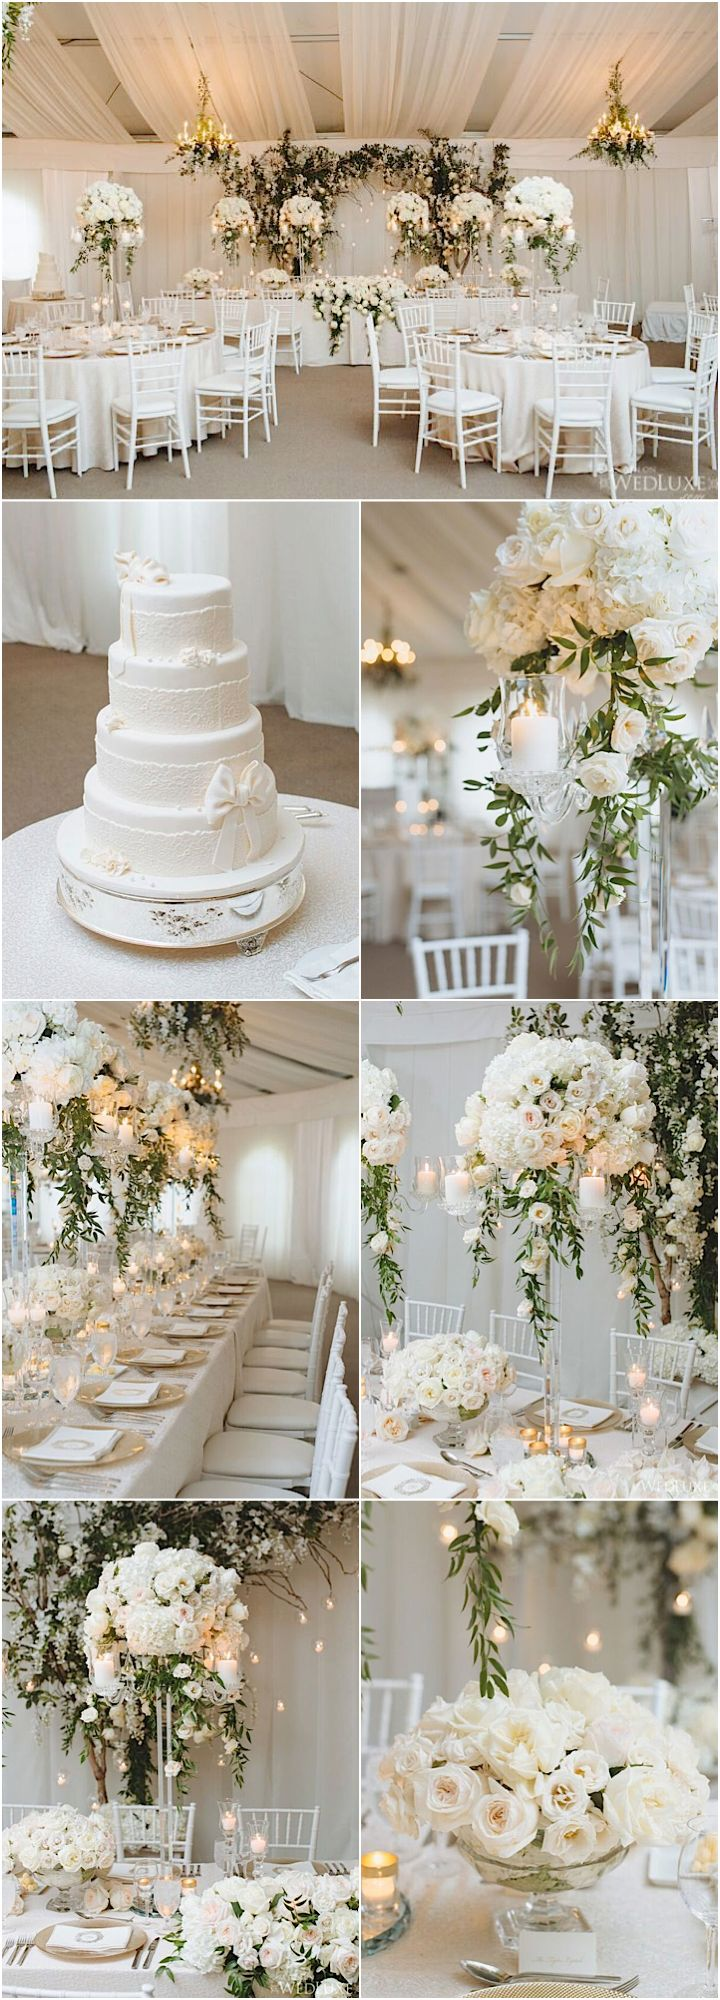 Featured Photographer: Mango Studios; white wedding reception details